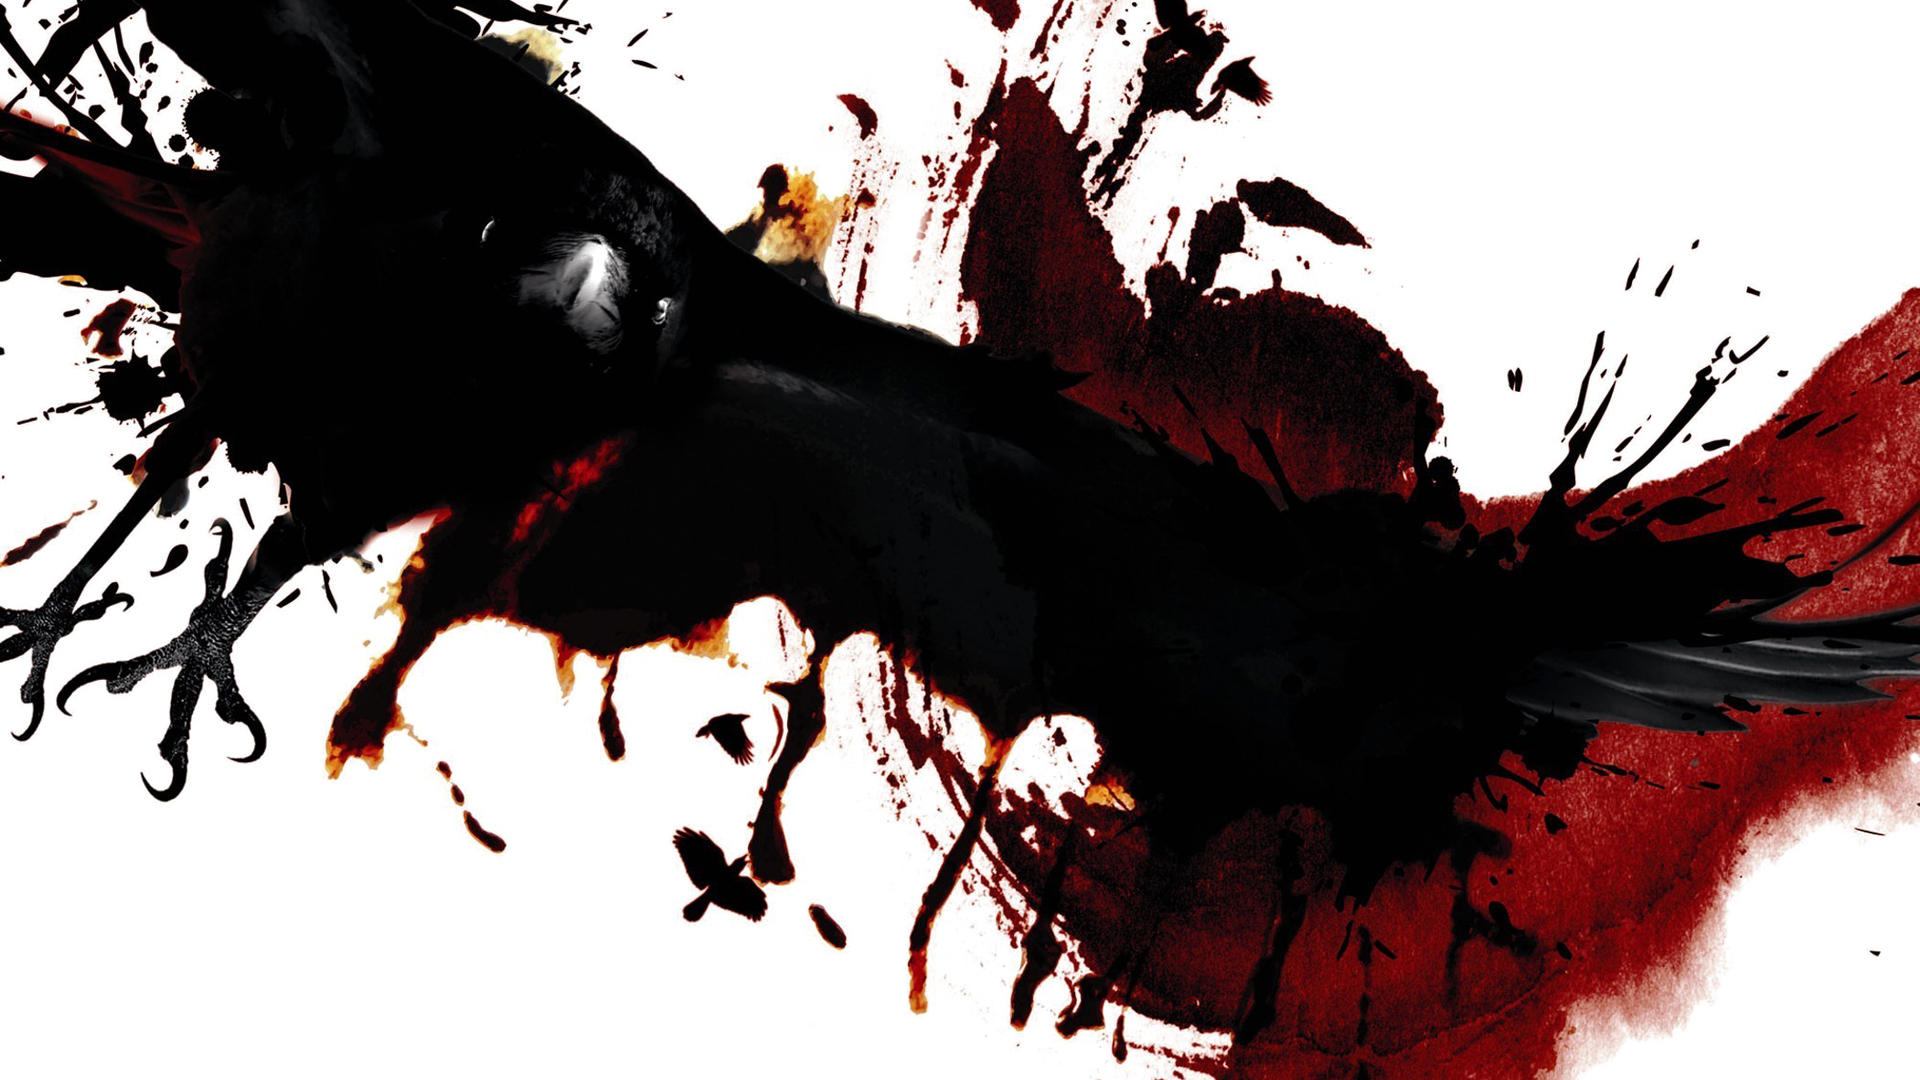 THE RAVEN dark blood wallpaper 1920x1080 102957 WallpaperUP 1920x1080